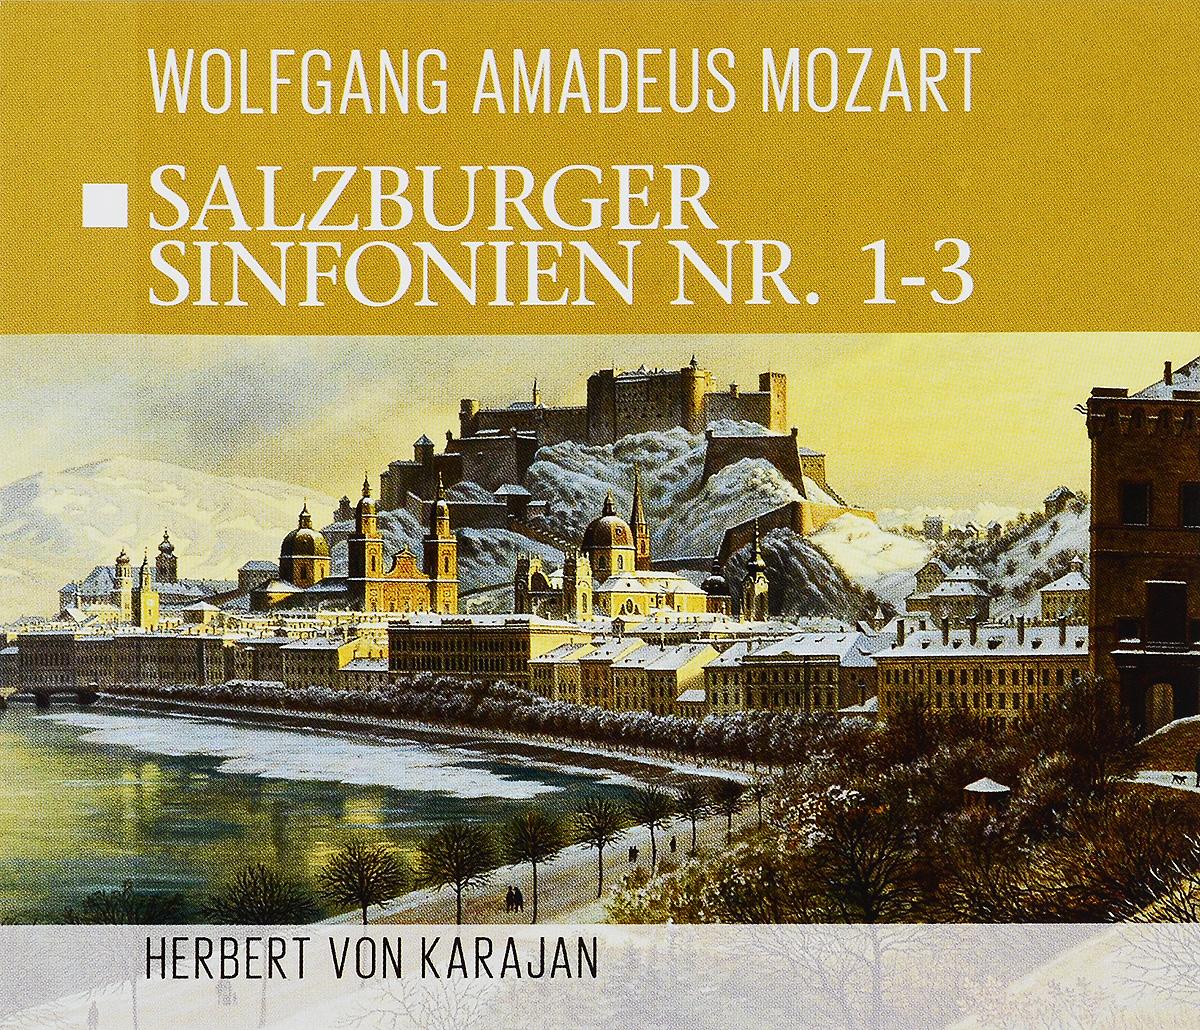 лучшая цена Herbert Von Karajan. Wolfgang Amadeus Mozart. Salzburger Sinfonien Nr. 1-3